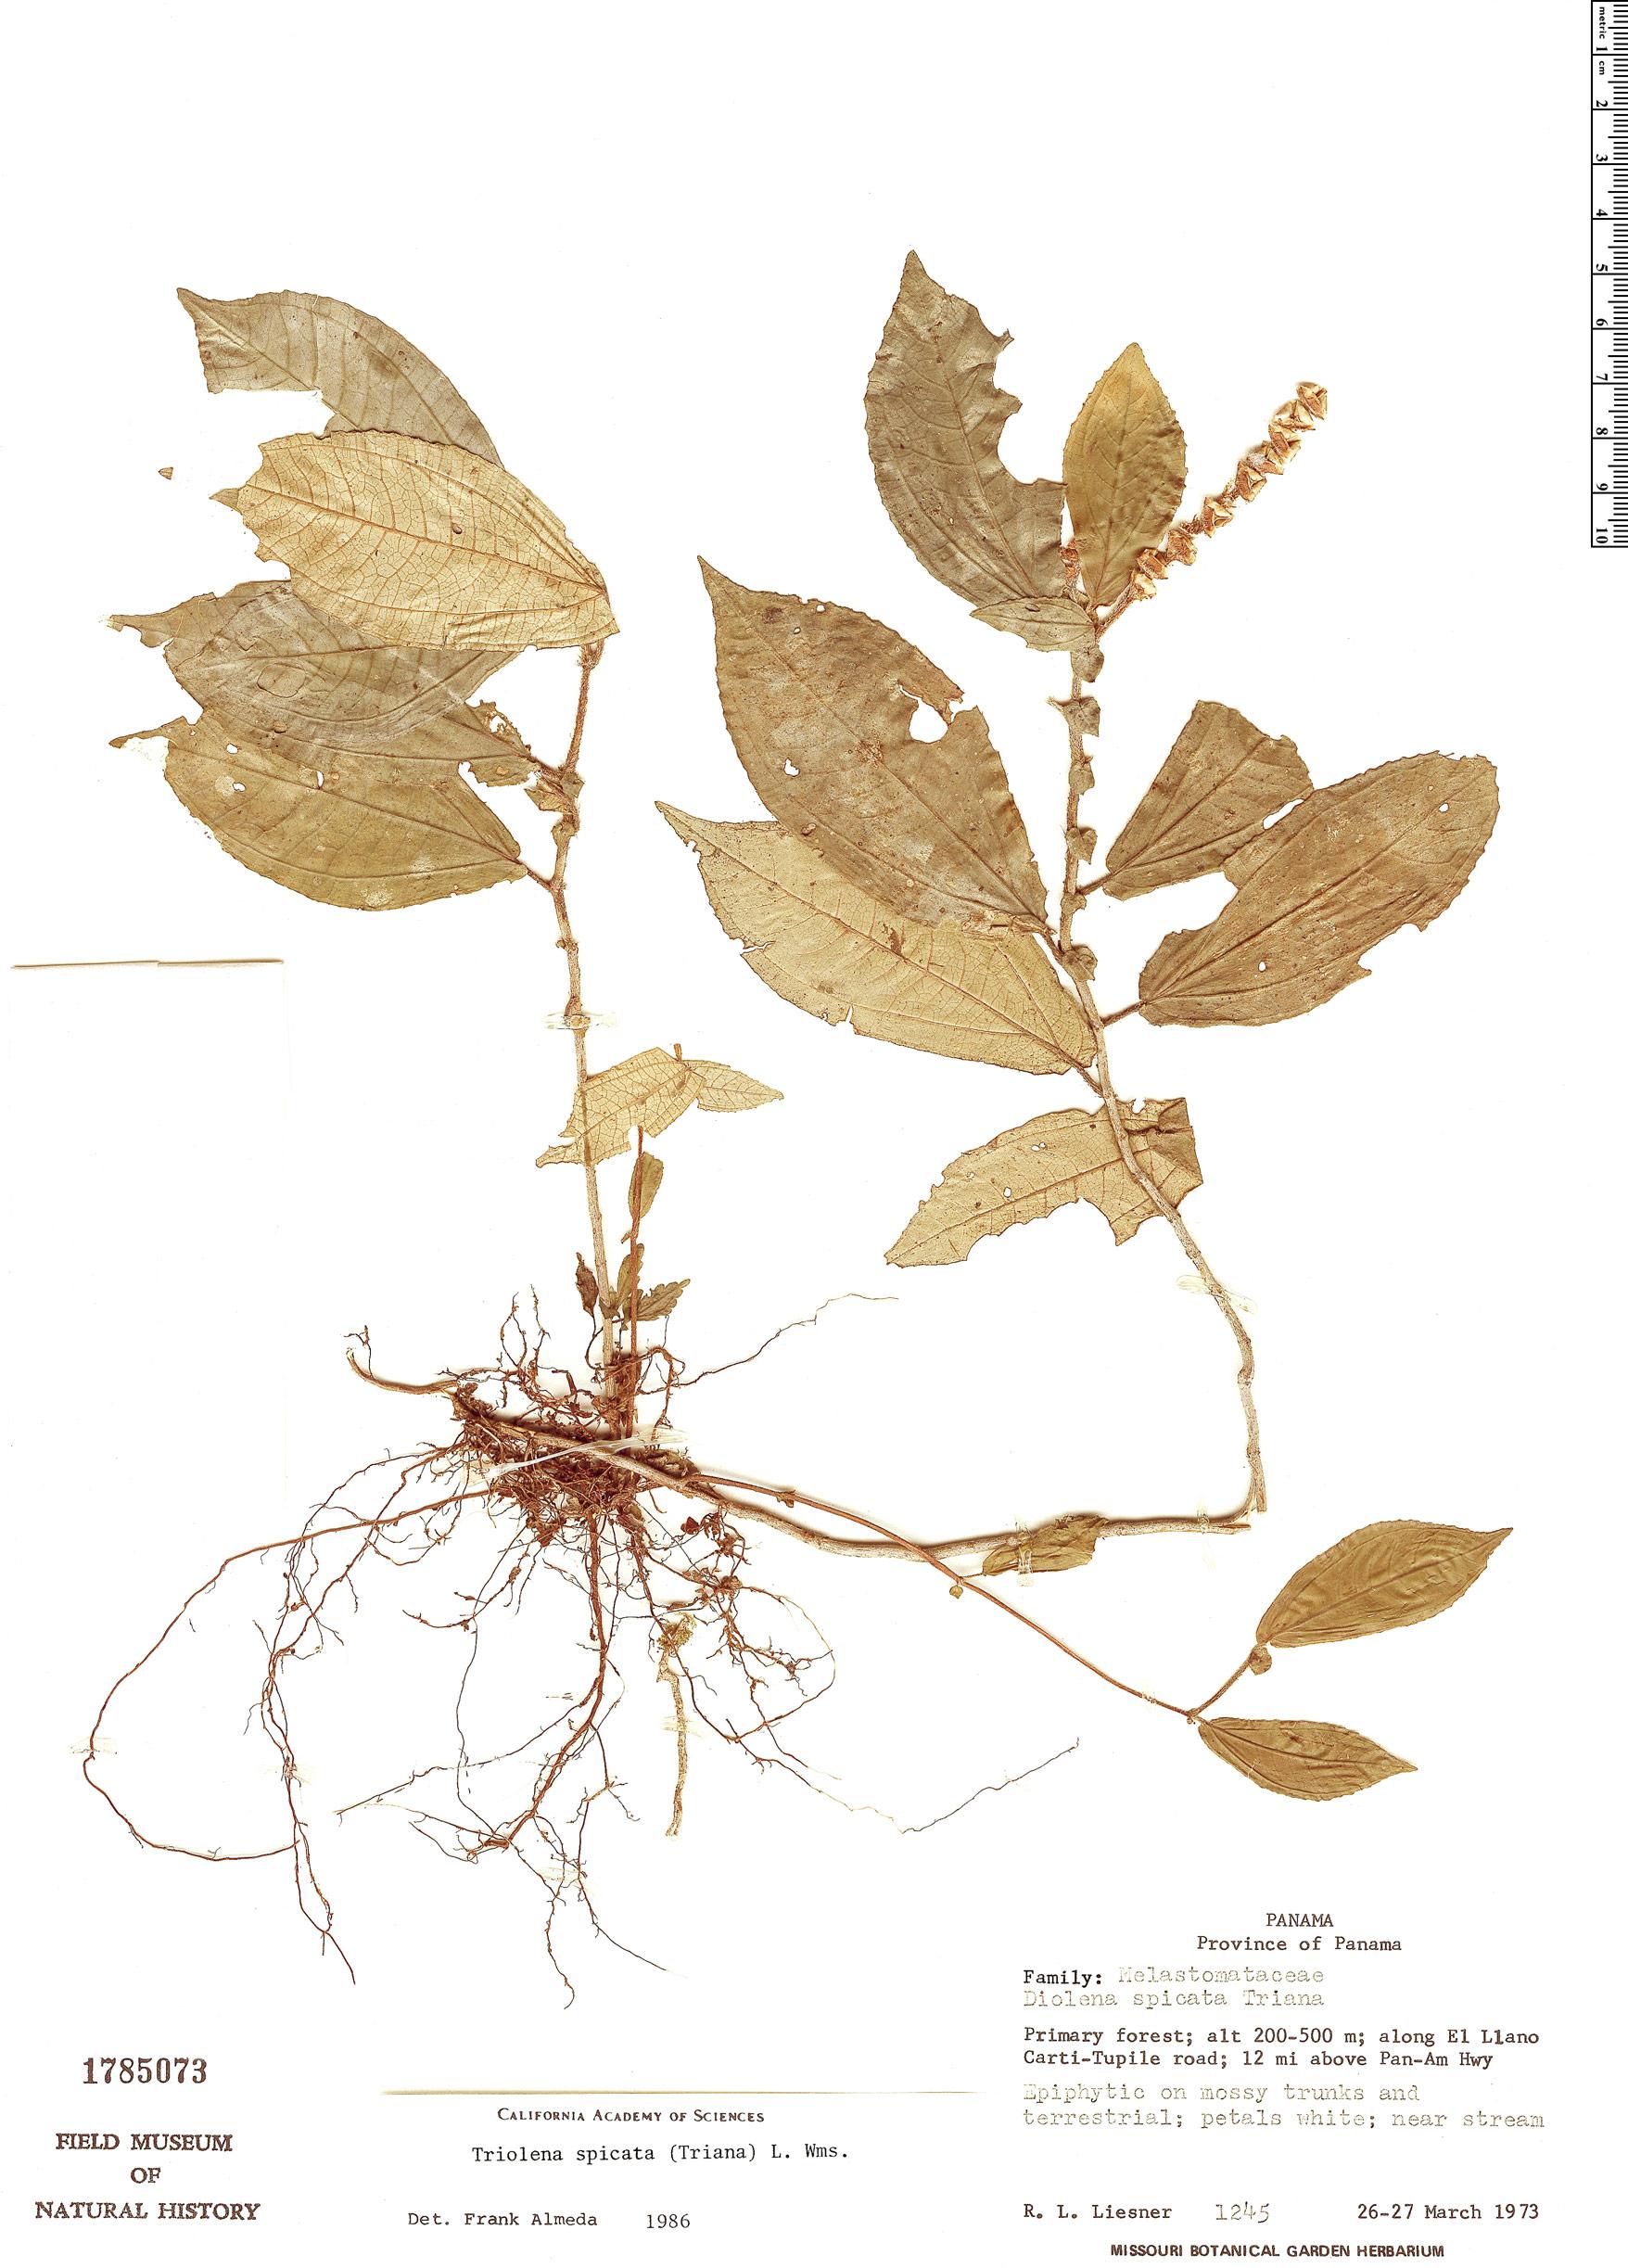 Specimen: Triolena spicata